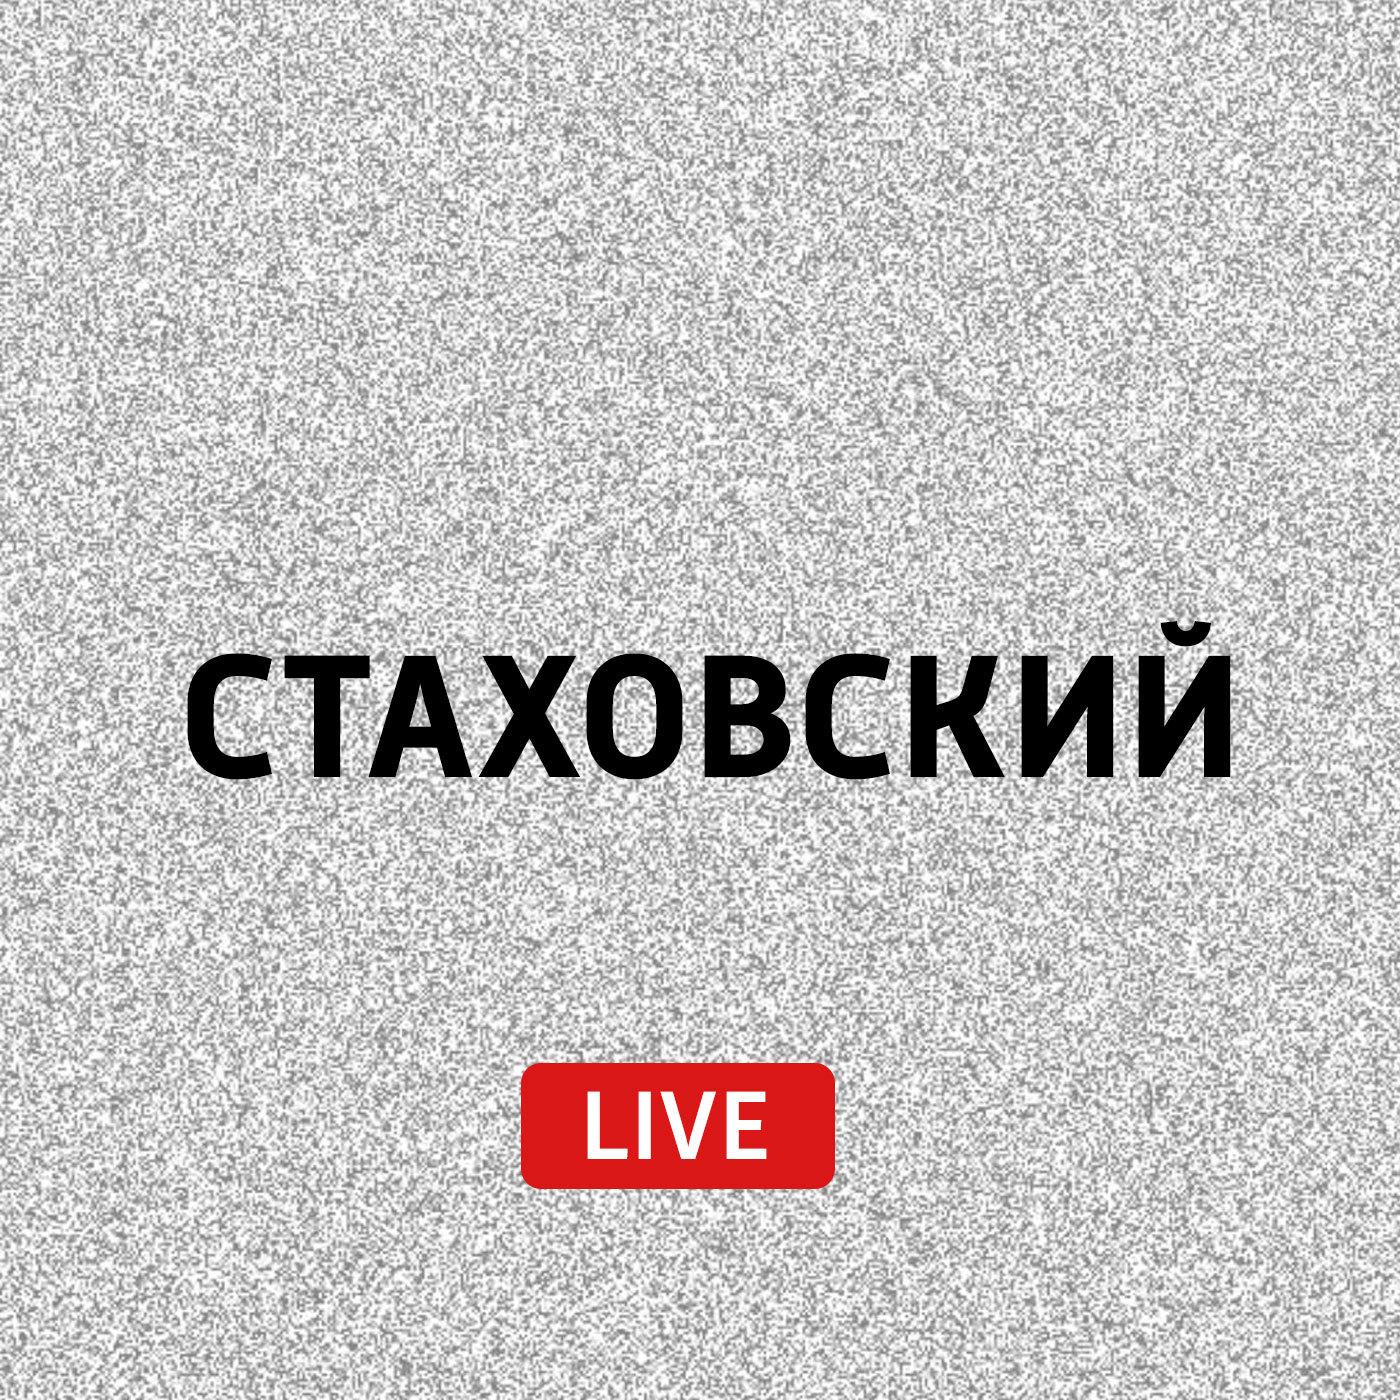 Евгений Стаховский Феномен соцсетей